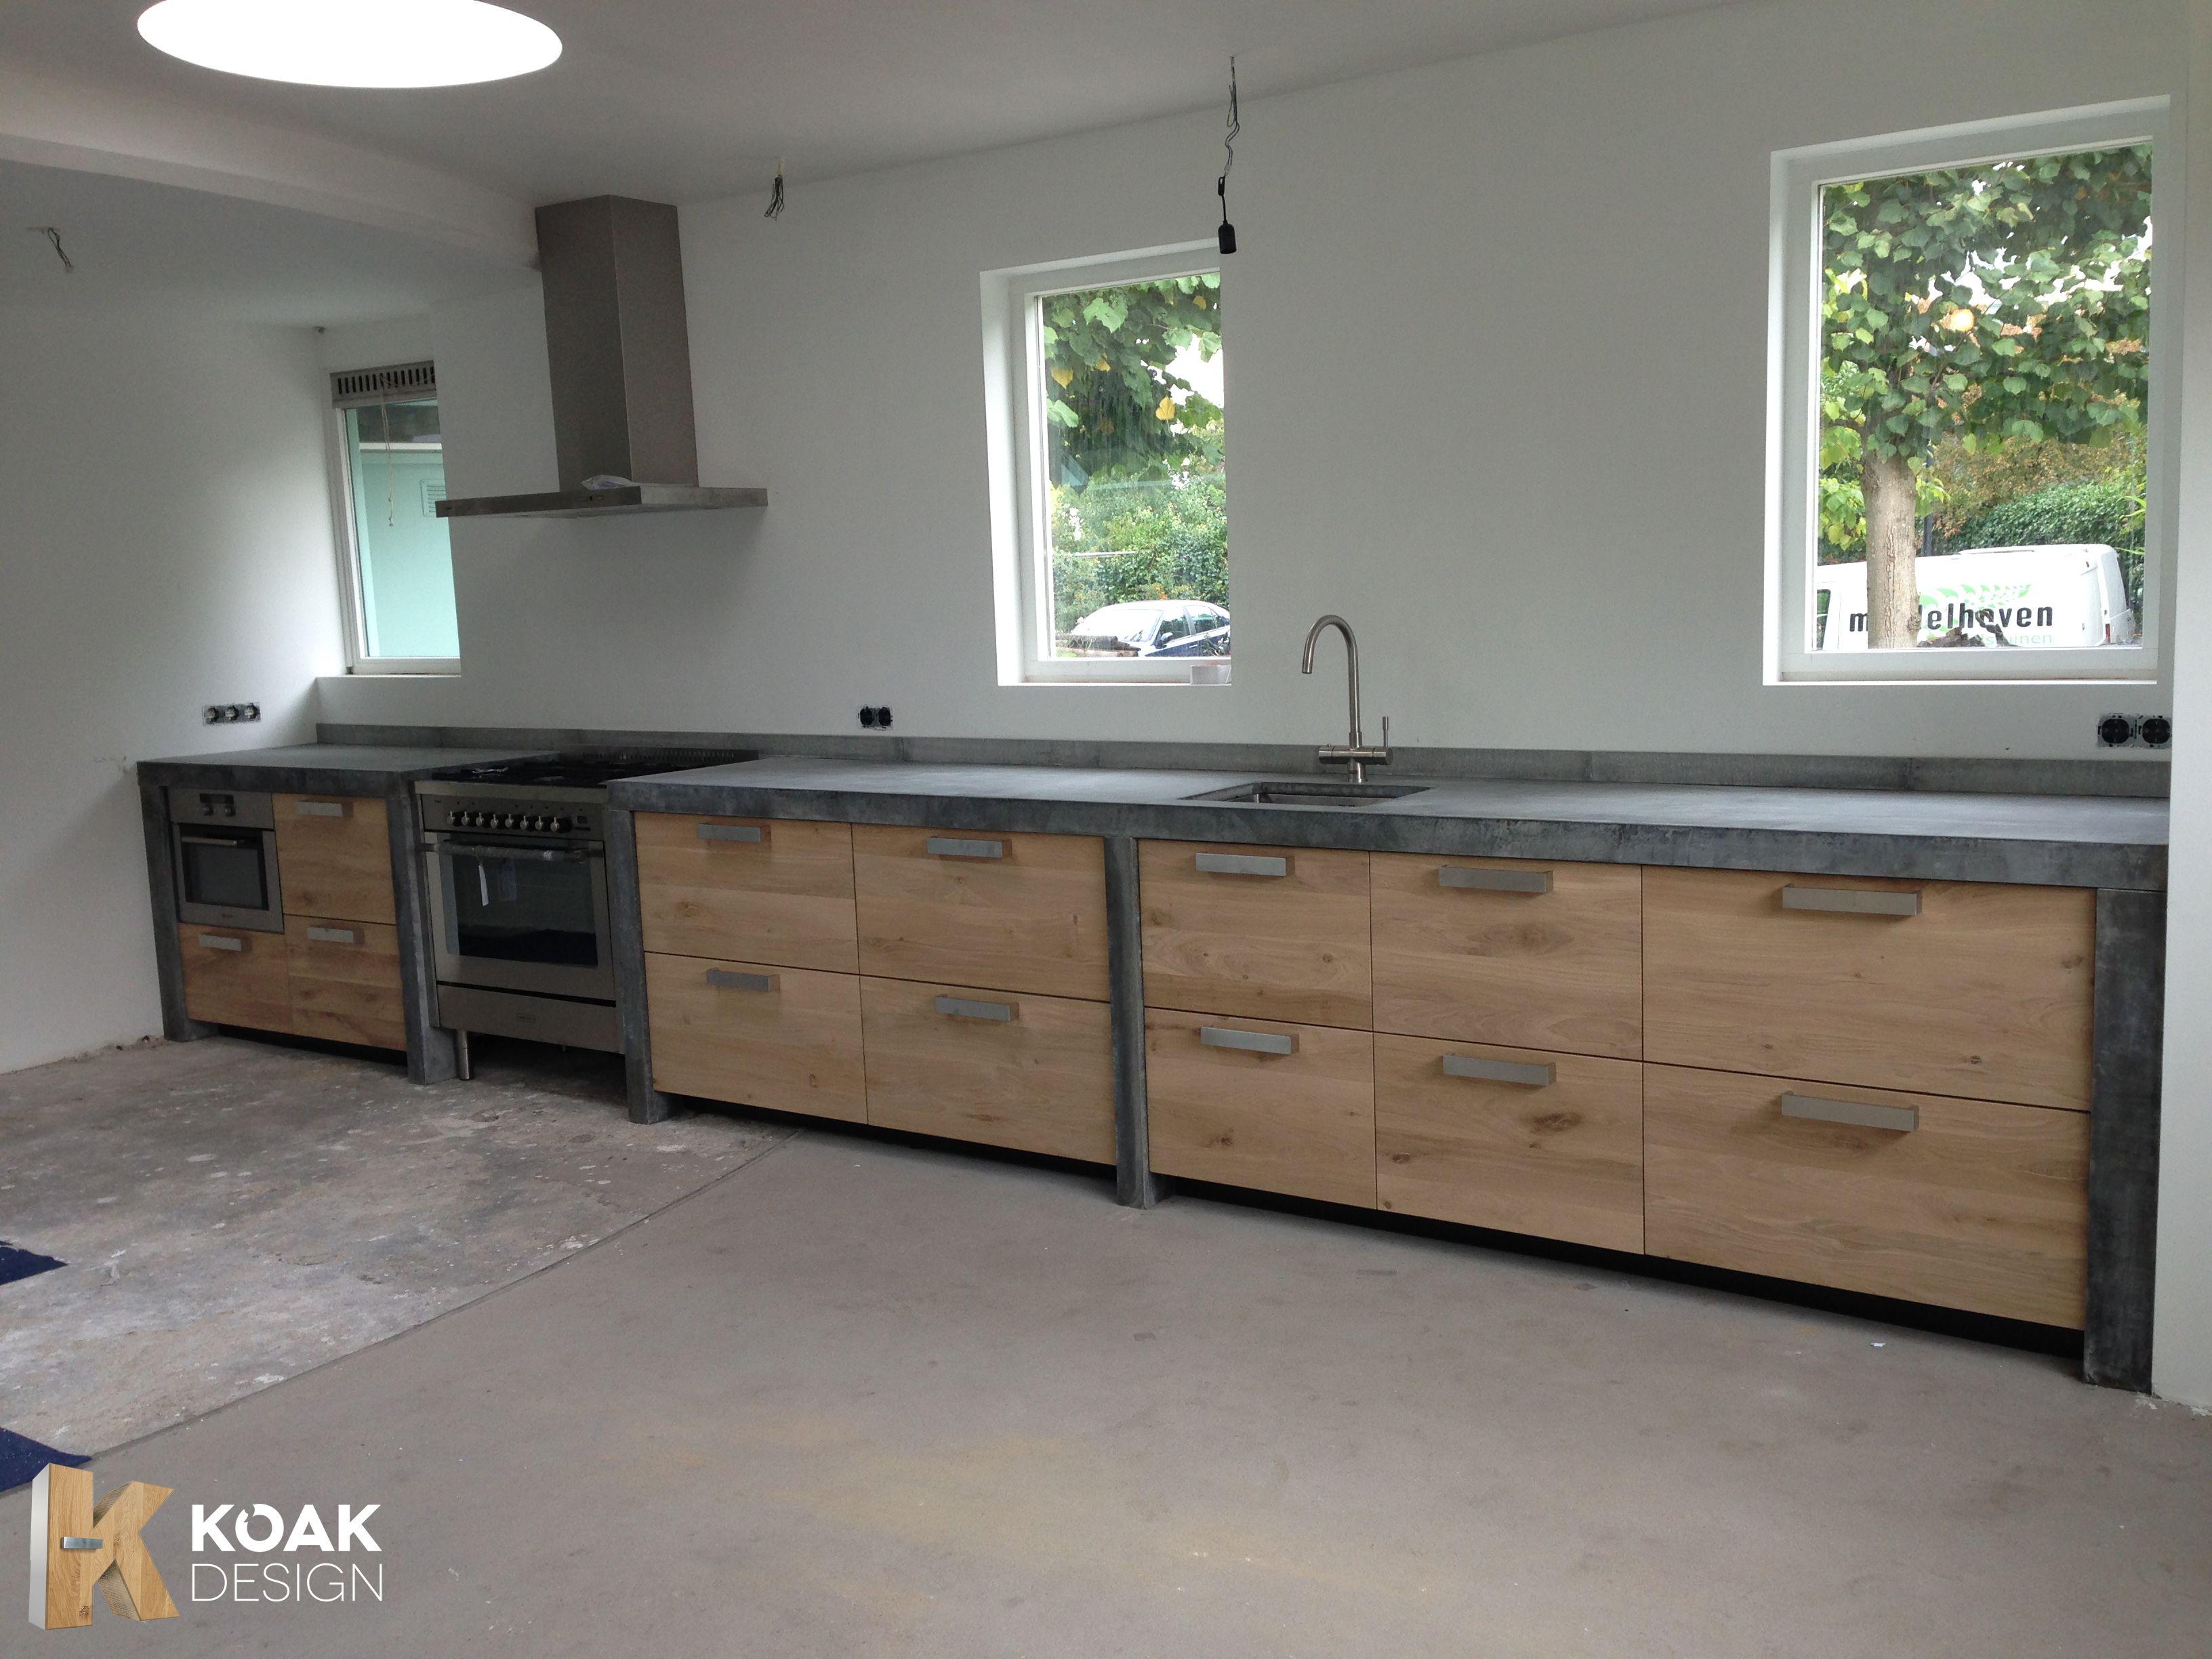 ikea kitchens cabinets diy outdoor kitchen ideas hack wooden doors for